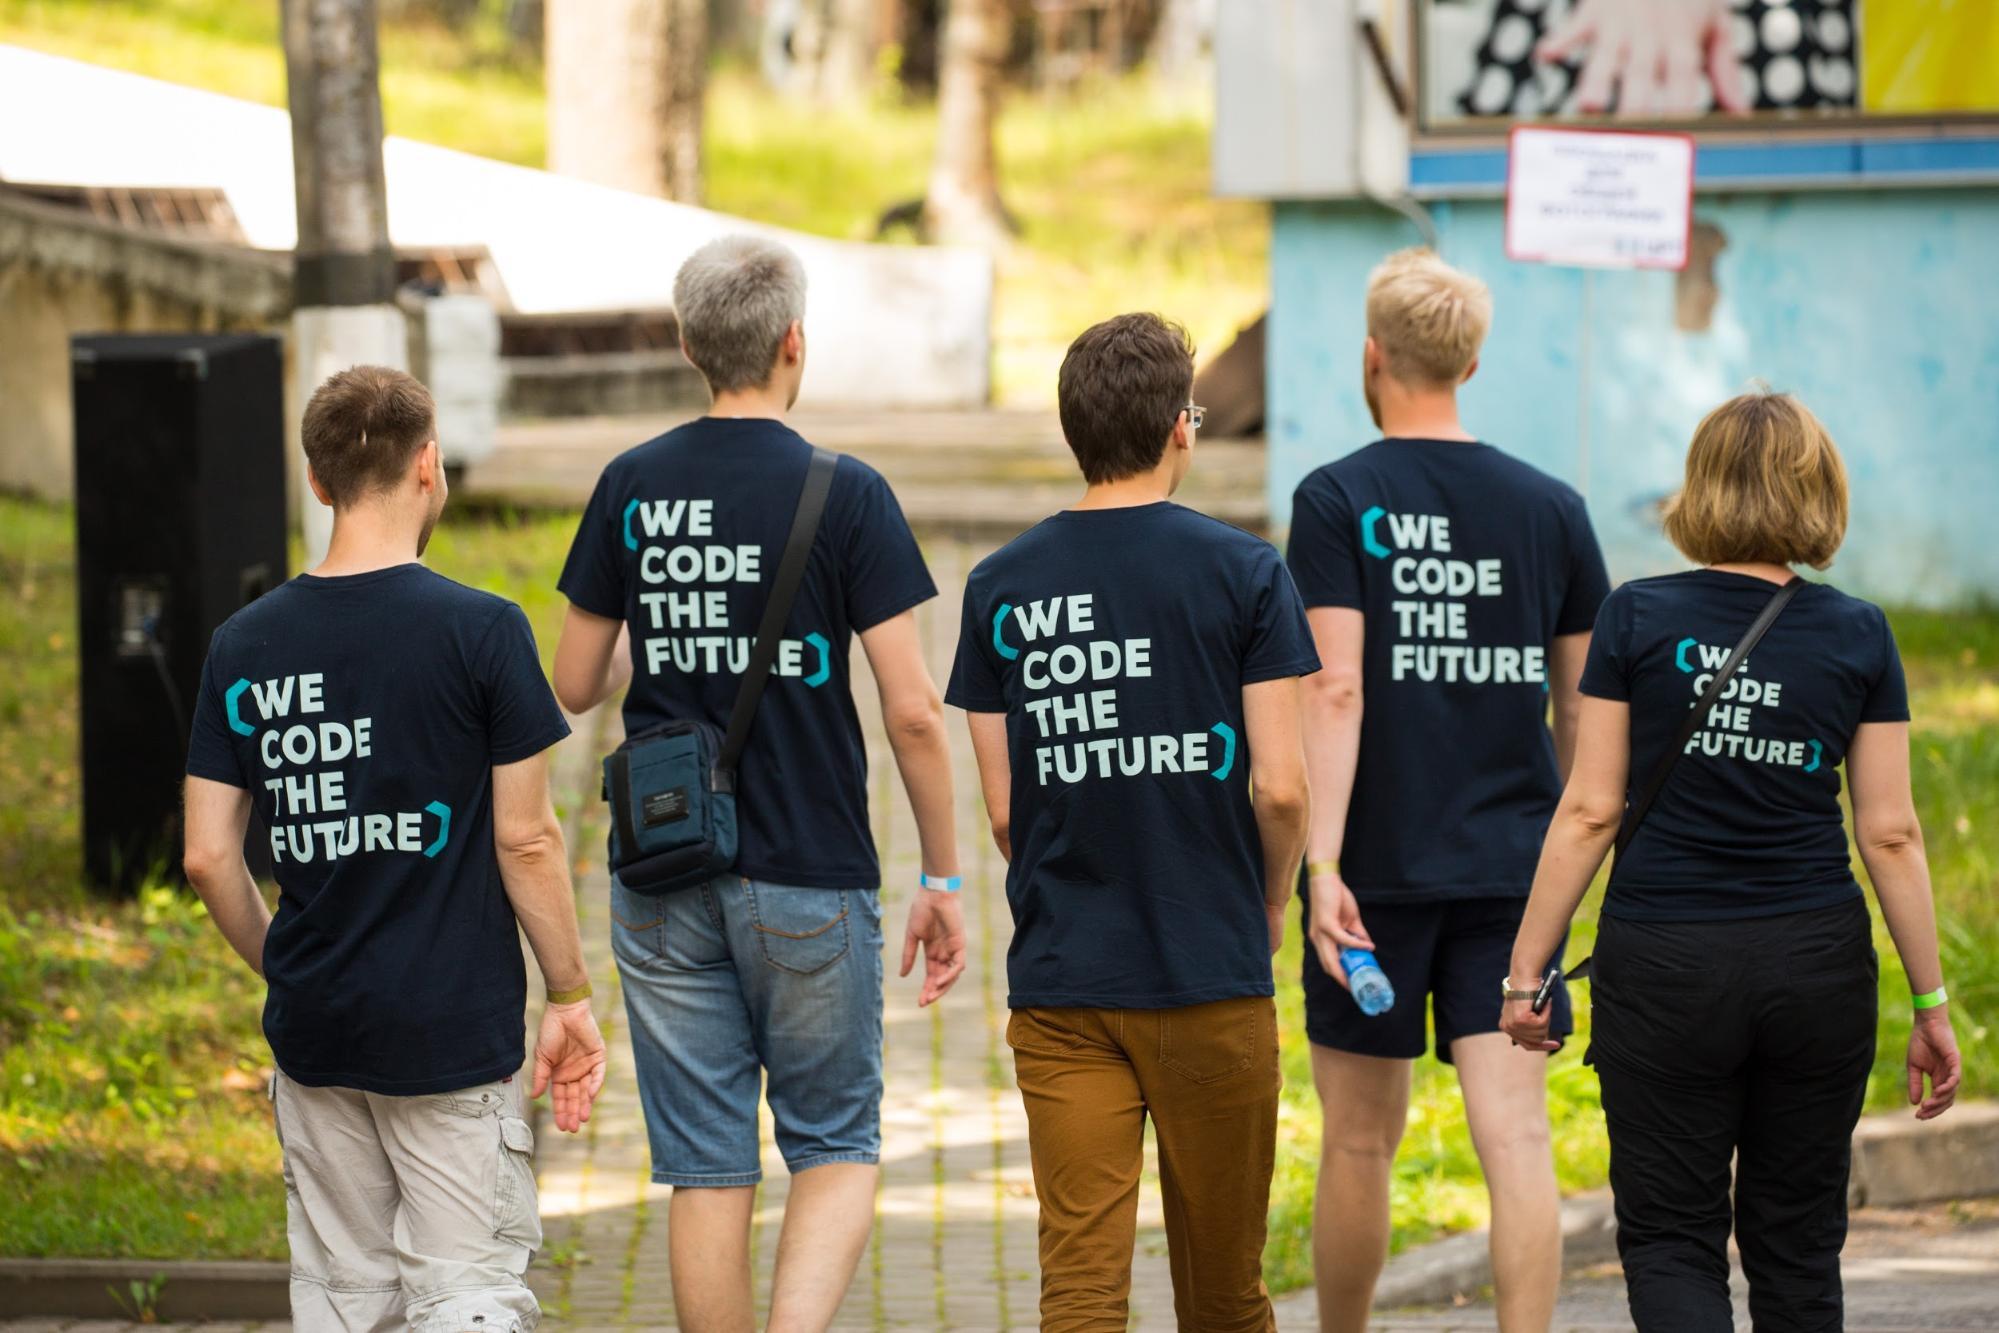 ЦРТ: We code the future. Присоединяйтесь!